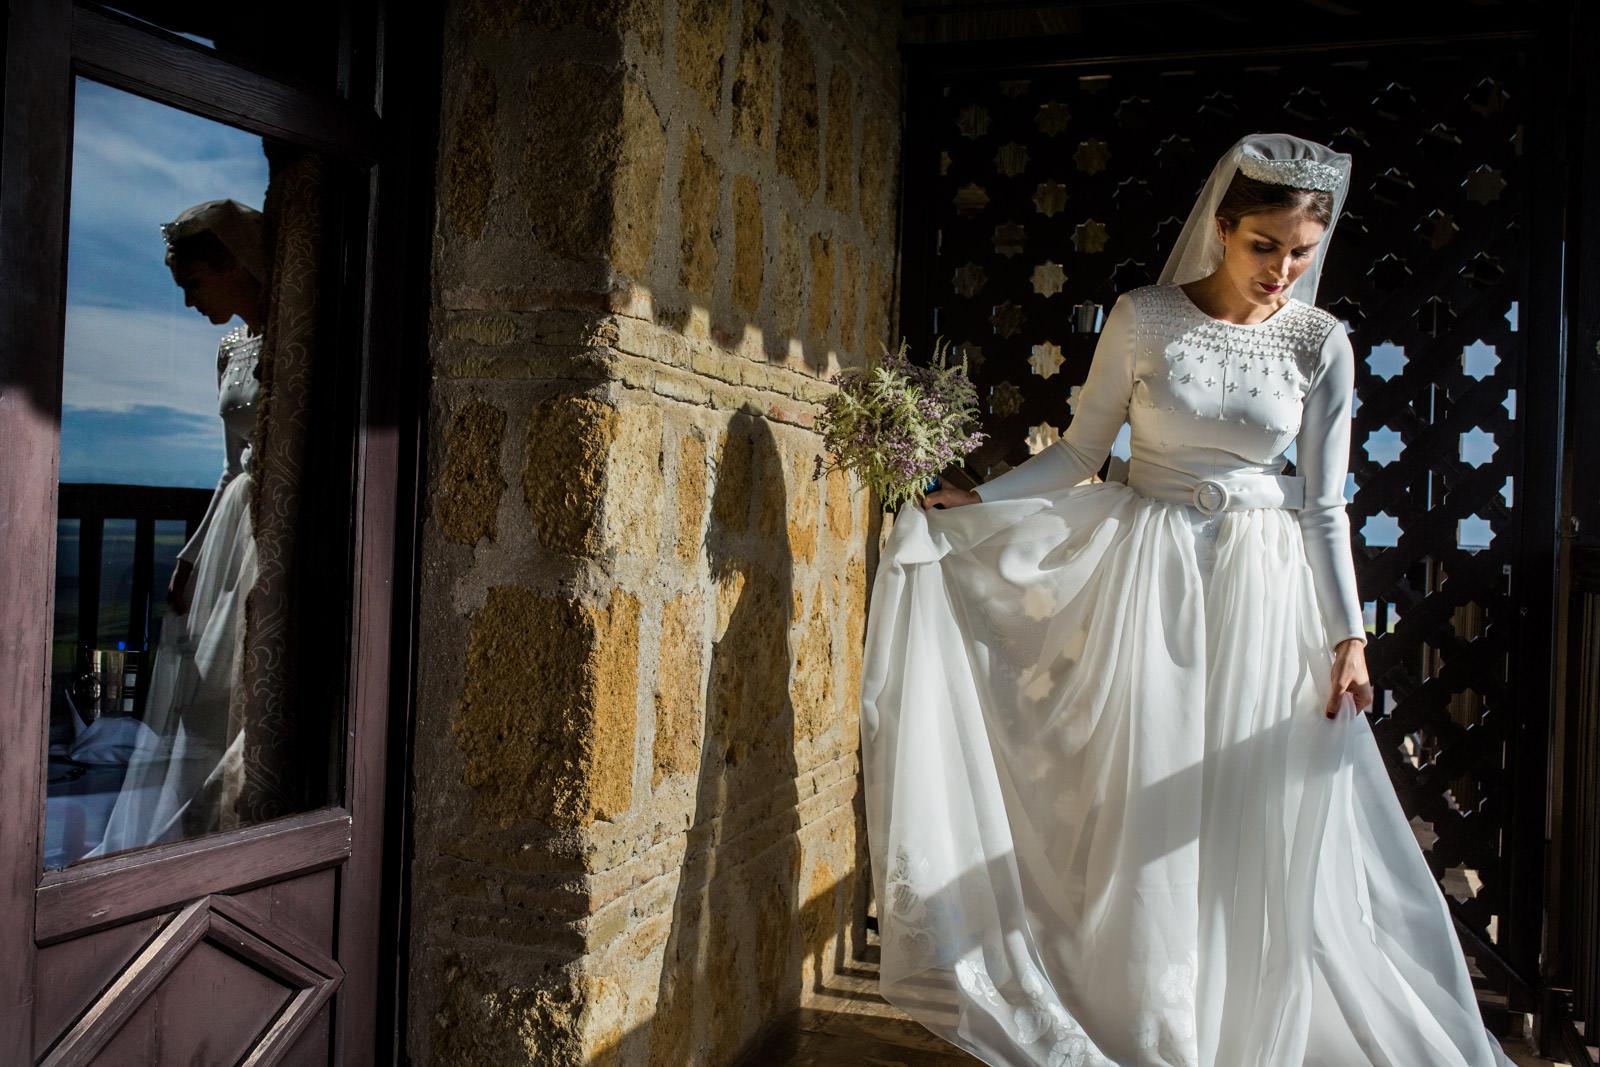 Wedroads-Boda-Sevilla-Parador-Carmona-bridal-engagement-Rafael-Torres-fotografo-bodas-sevilla-madrid-barcelona-wedding-photographer--29.jpg